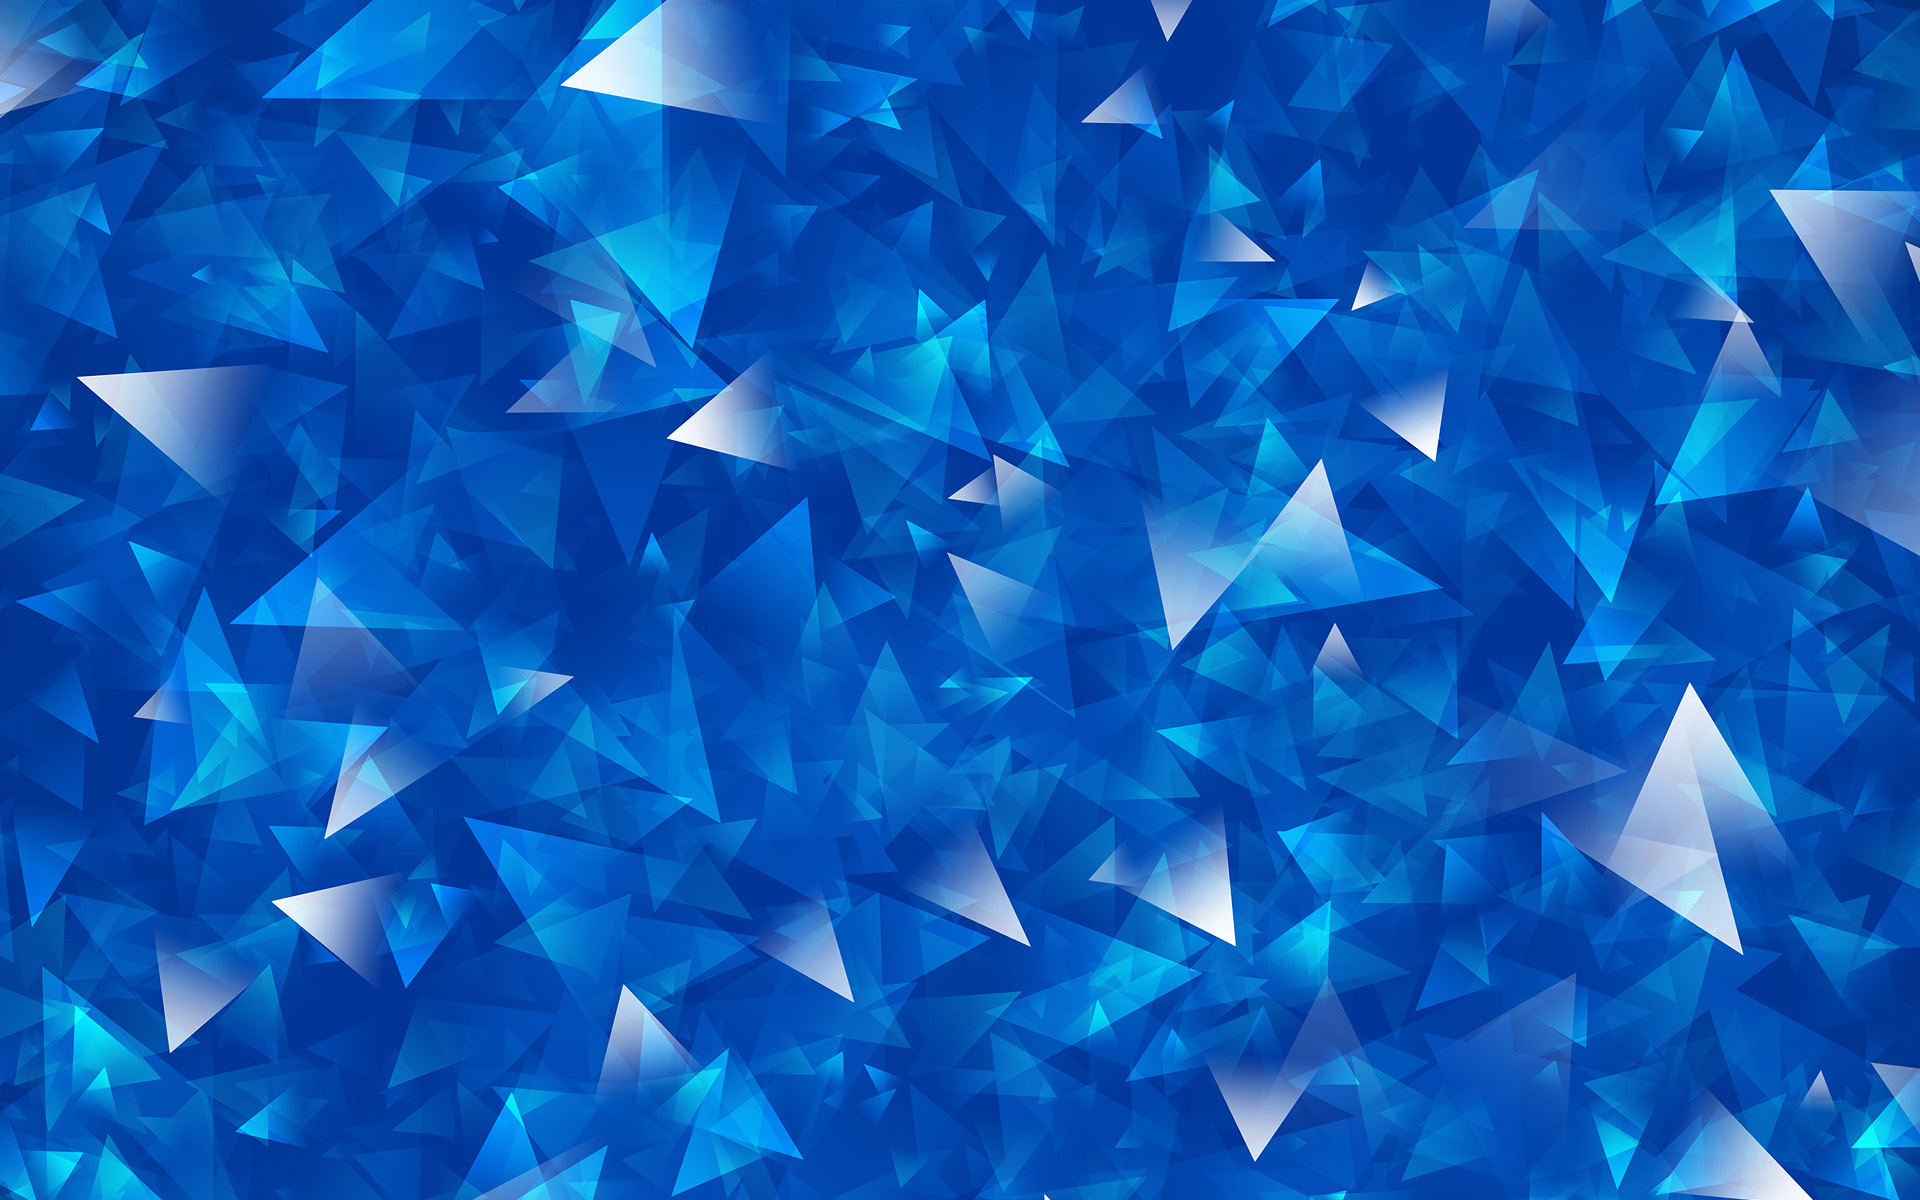 Hd Blue Computer Wallpaper Wallpapersafari